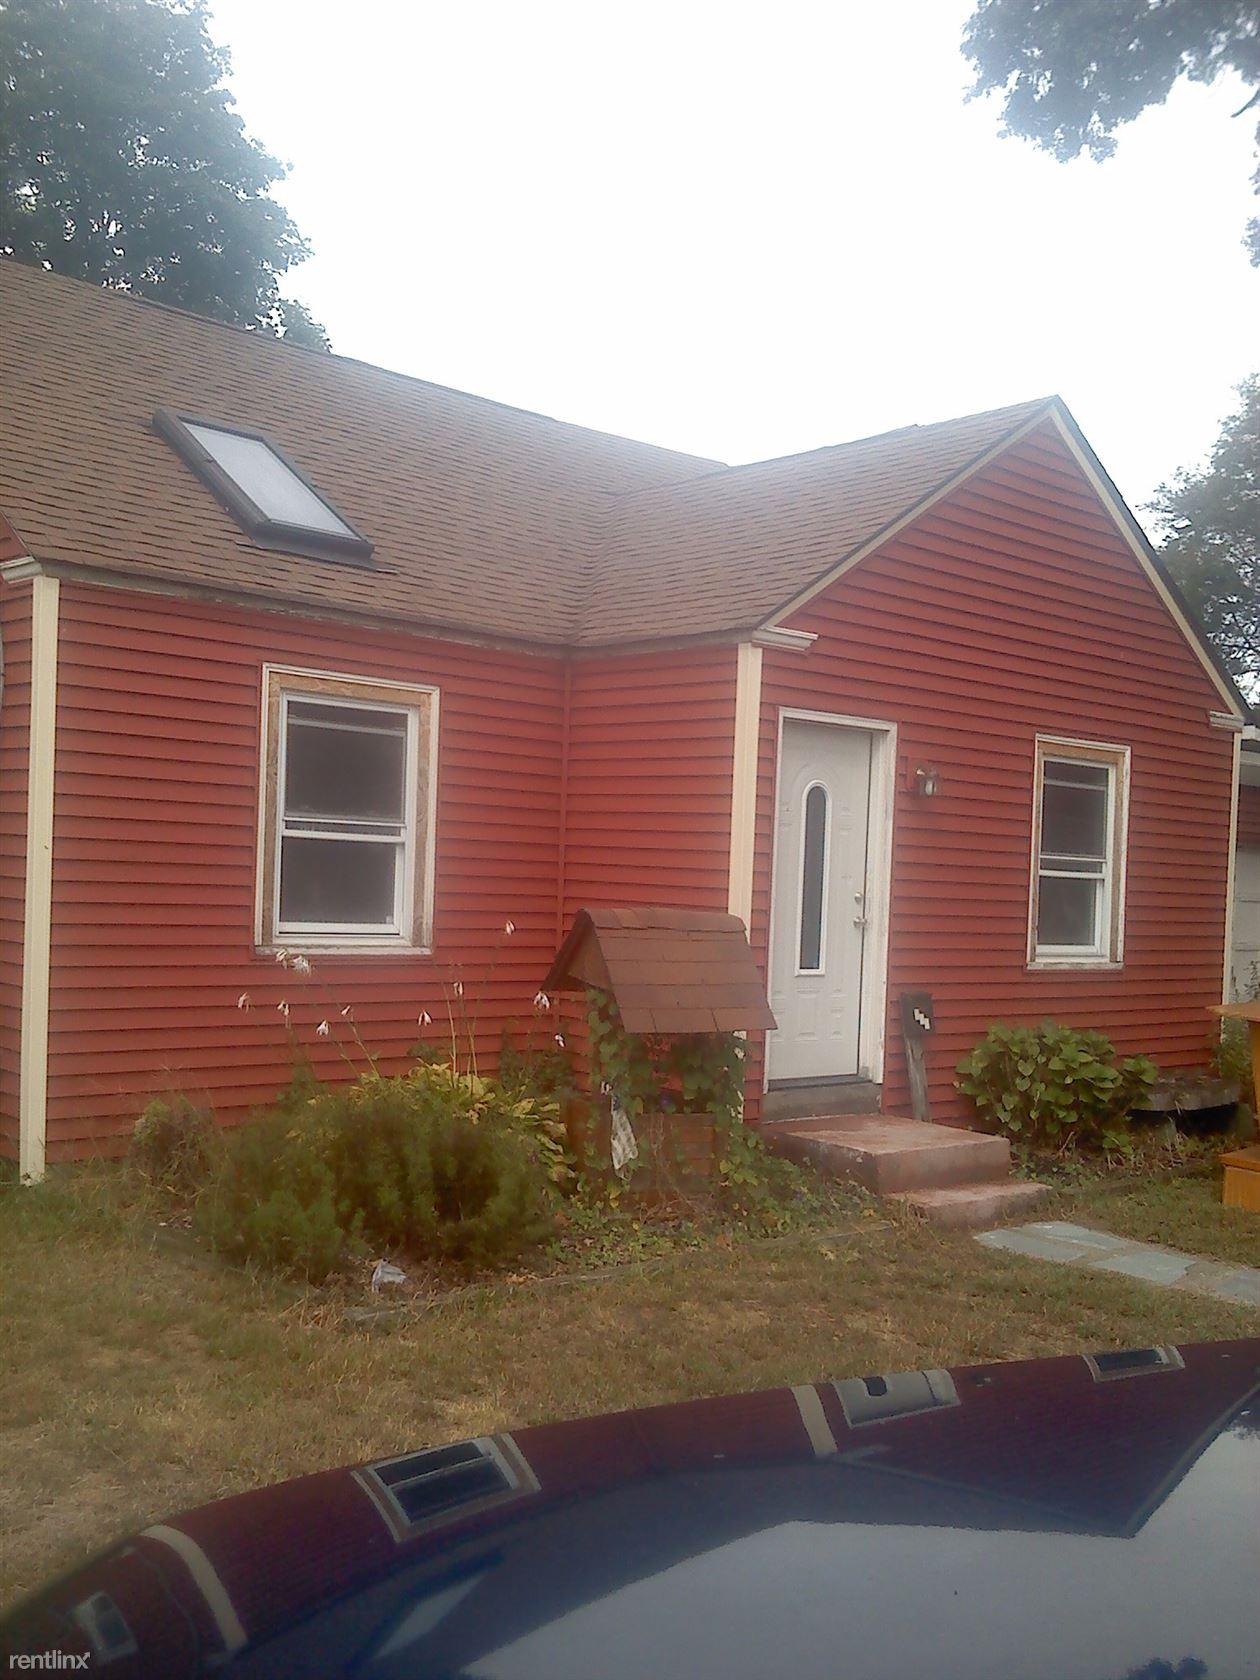 201 Pinnery Ave, Warwick, RI - $1,800